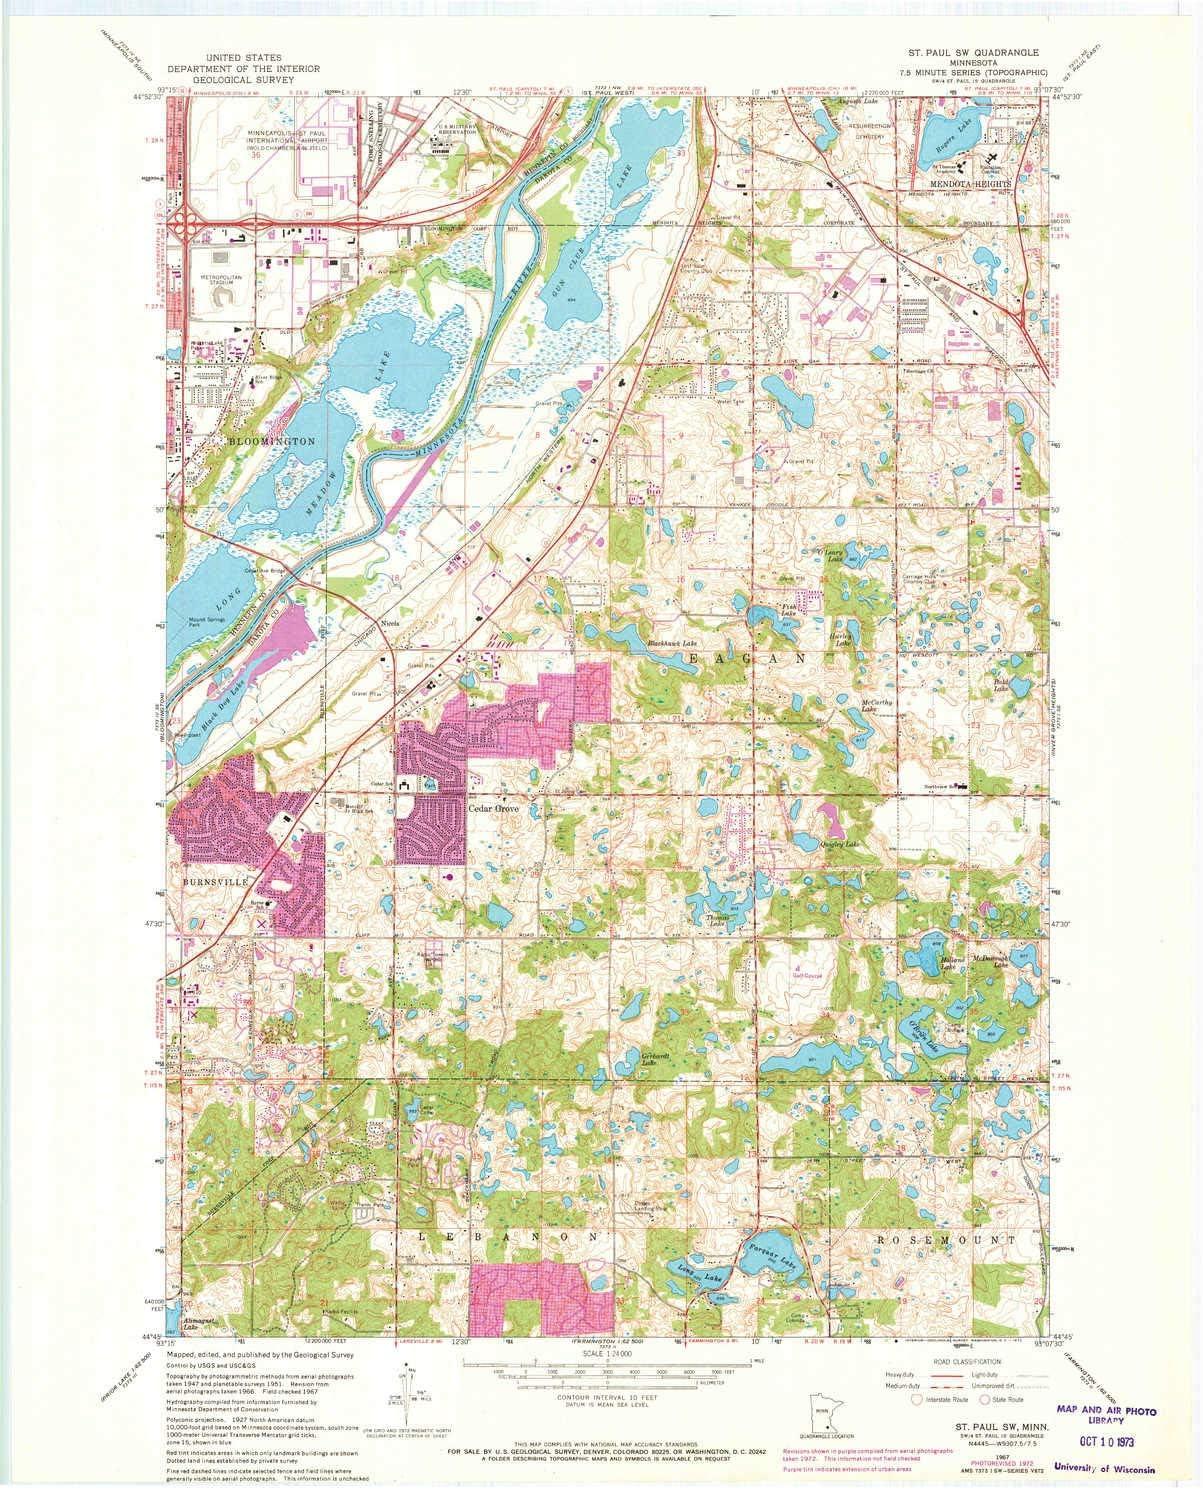 YellowMaps shipfree St Paul SW MN topo Scale 7.5 X Minu map unisex 1:24000